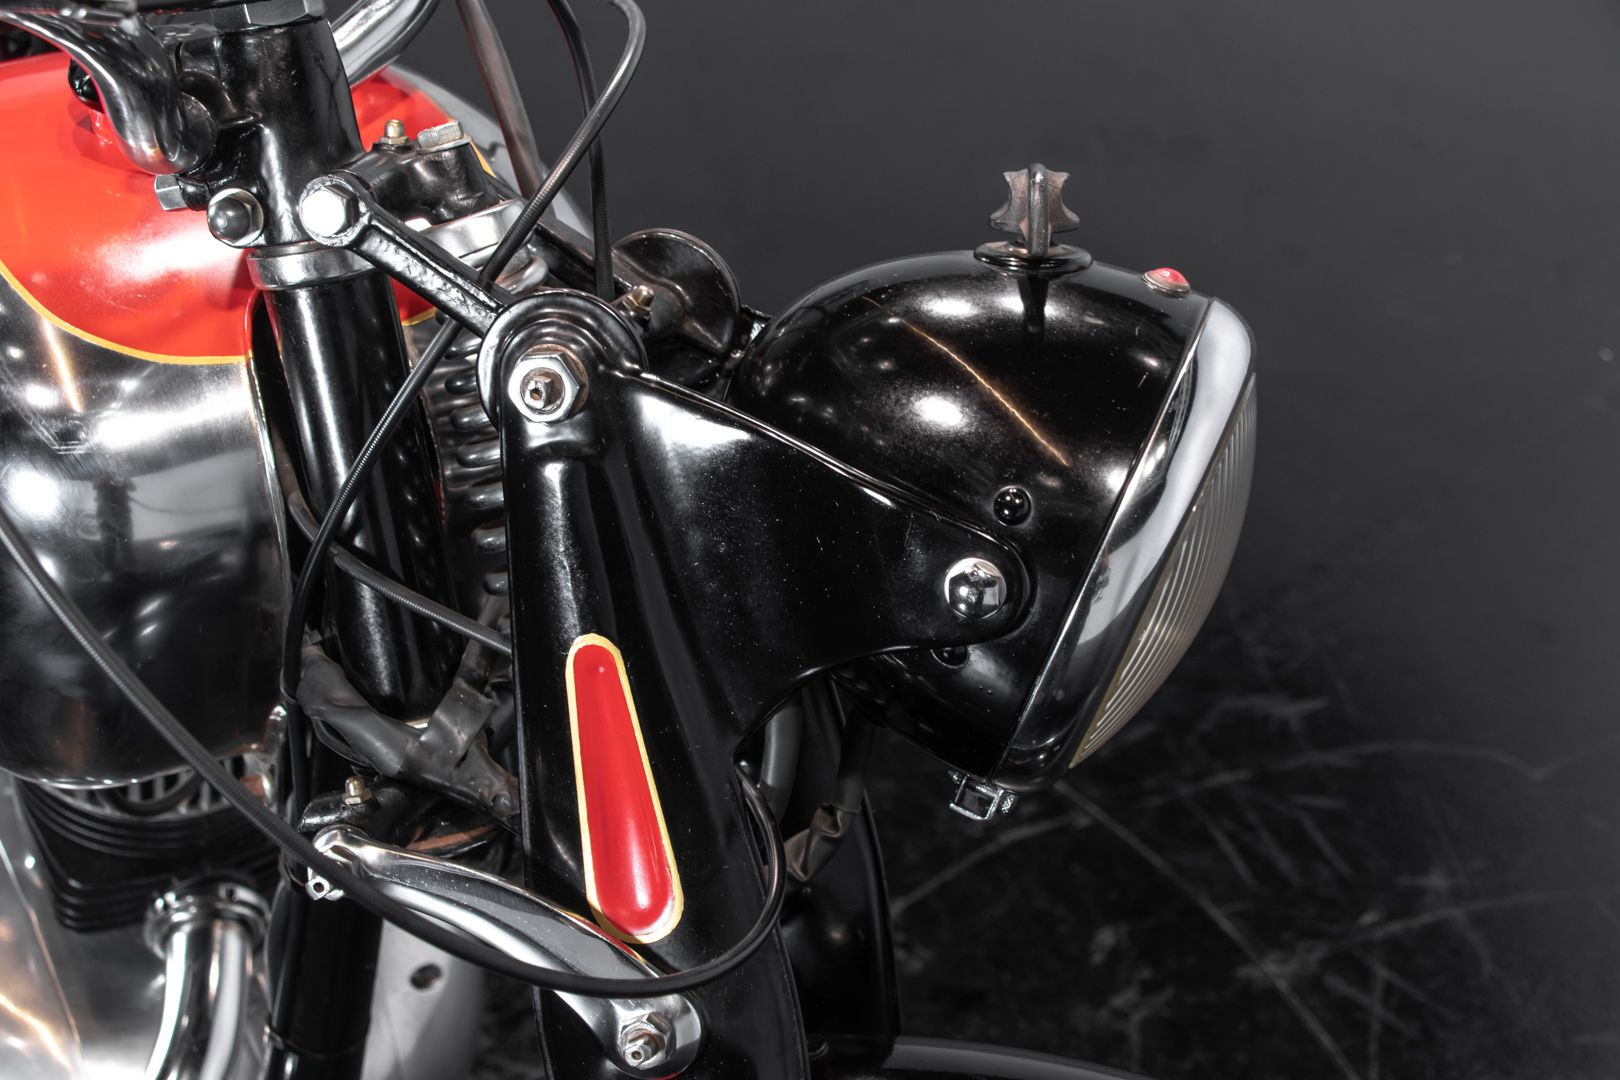 1952 Moto Morini Motore Lungo 2T 125 78789